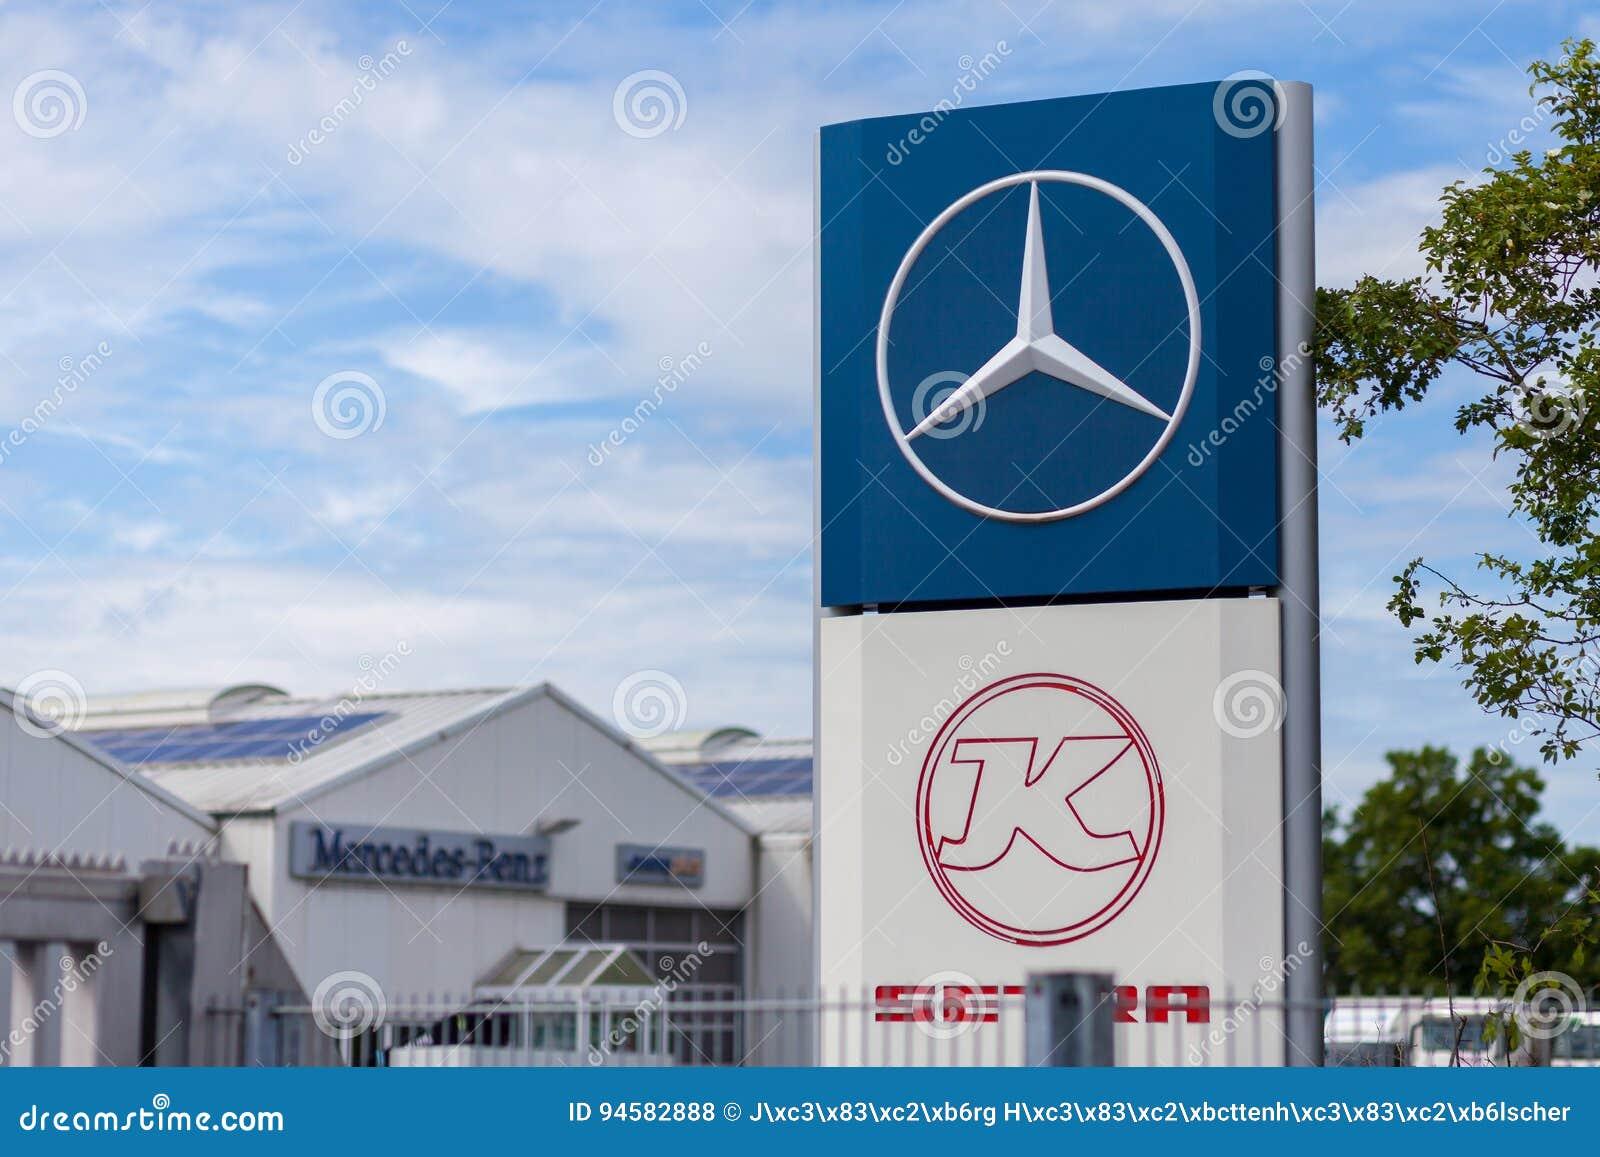 Logotipo de Mercedes-Benz cerca de un taller de trueque